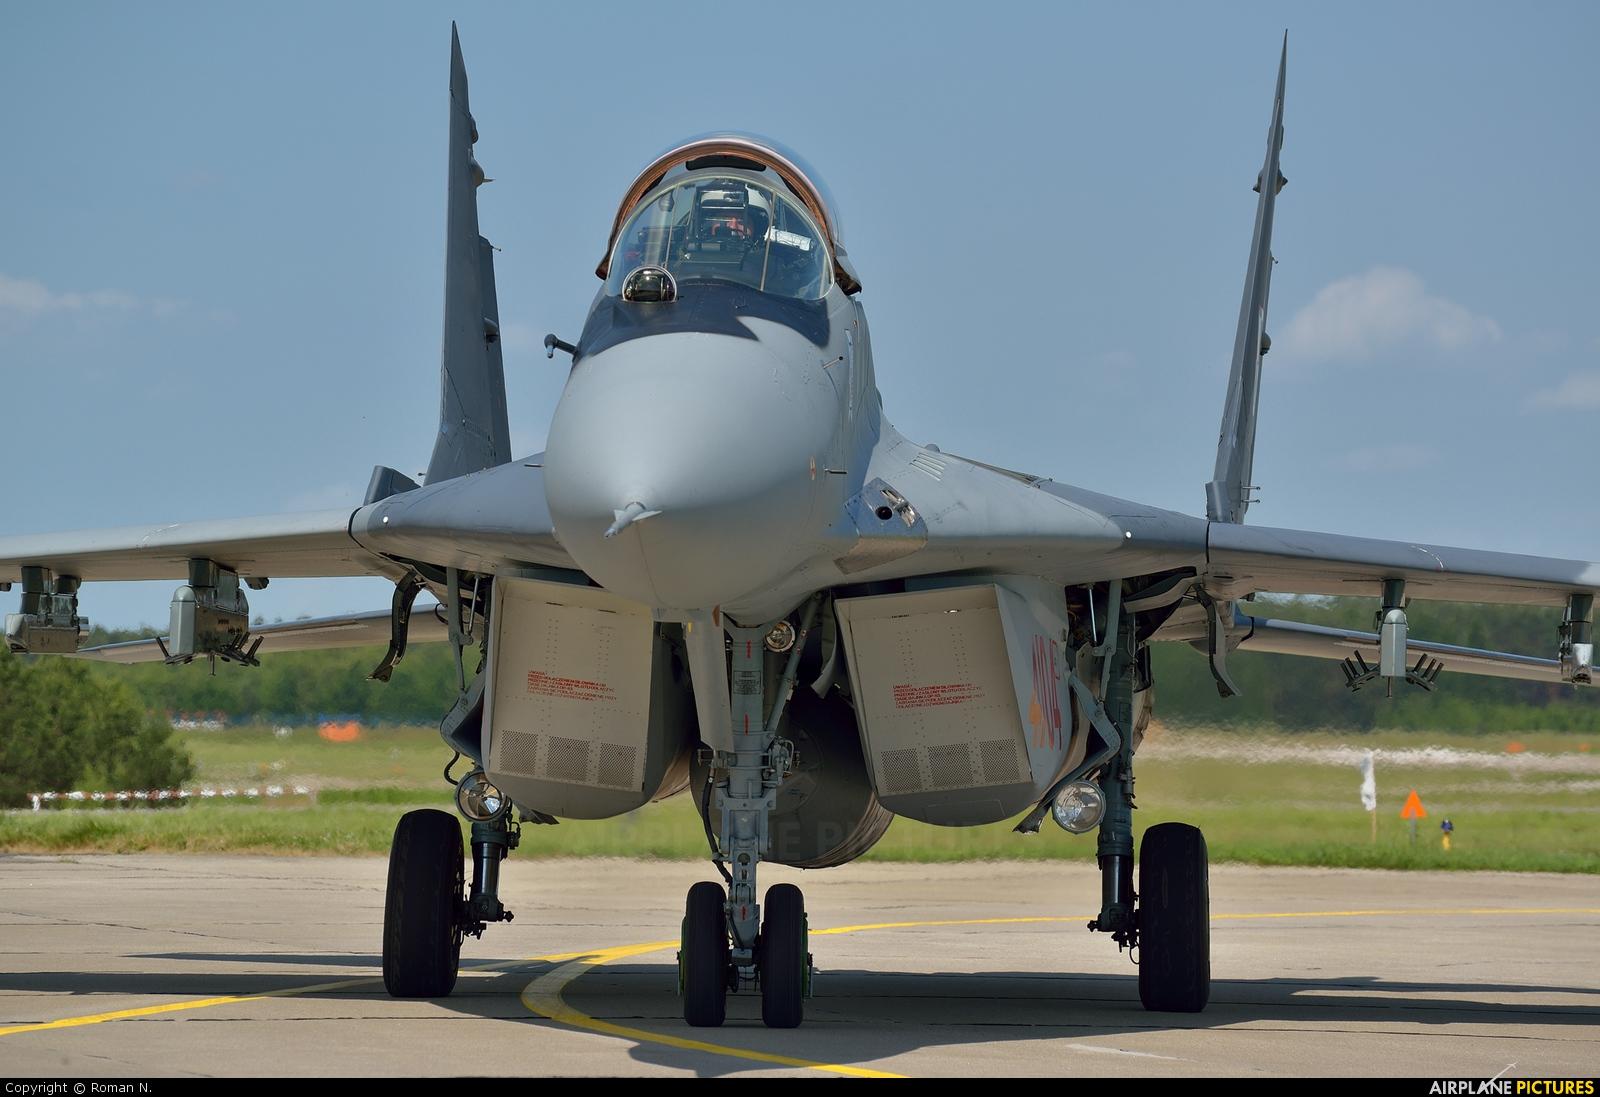 Poland - Air Force 4104 aircraft at Mirosławiec